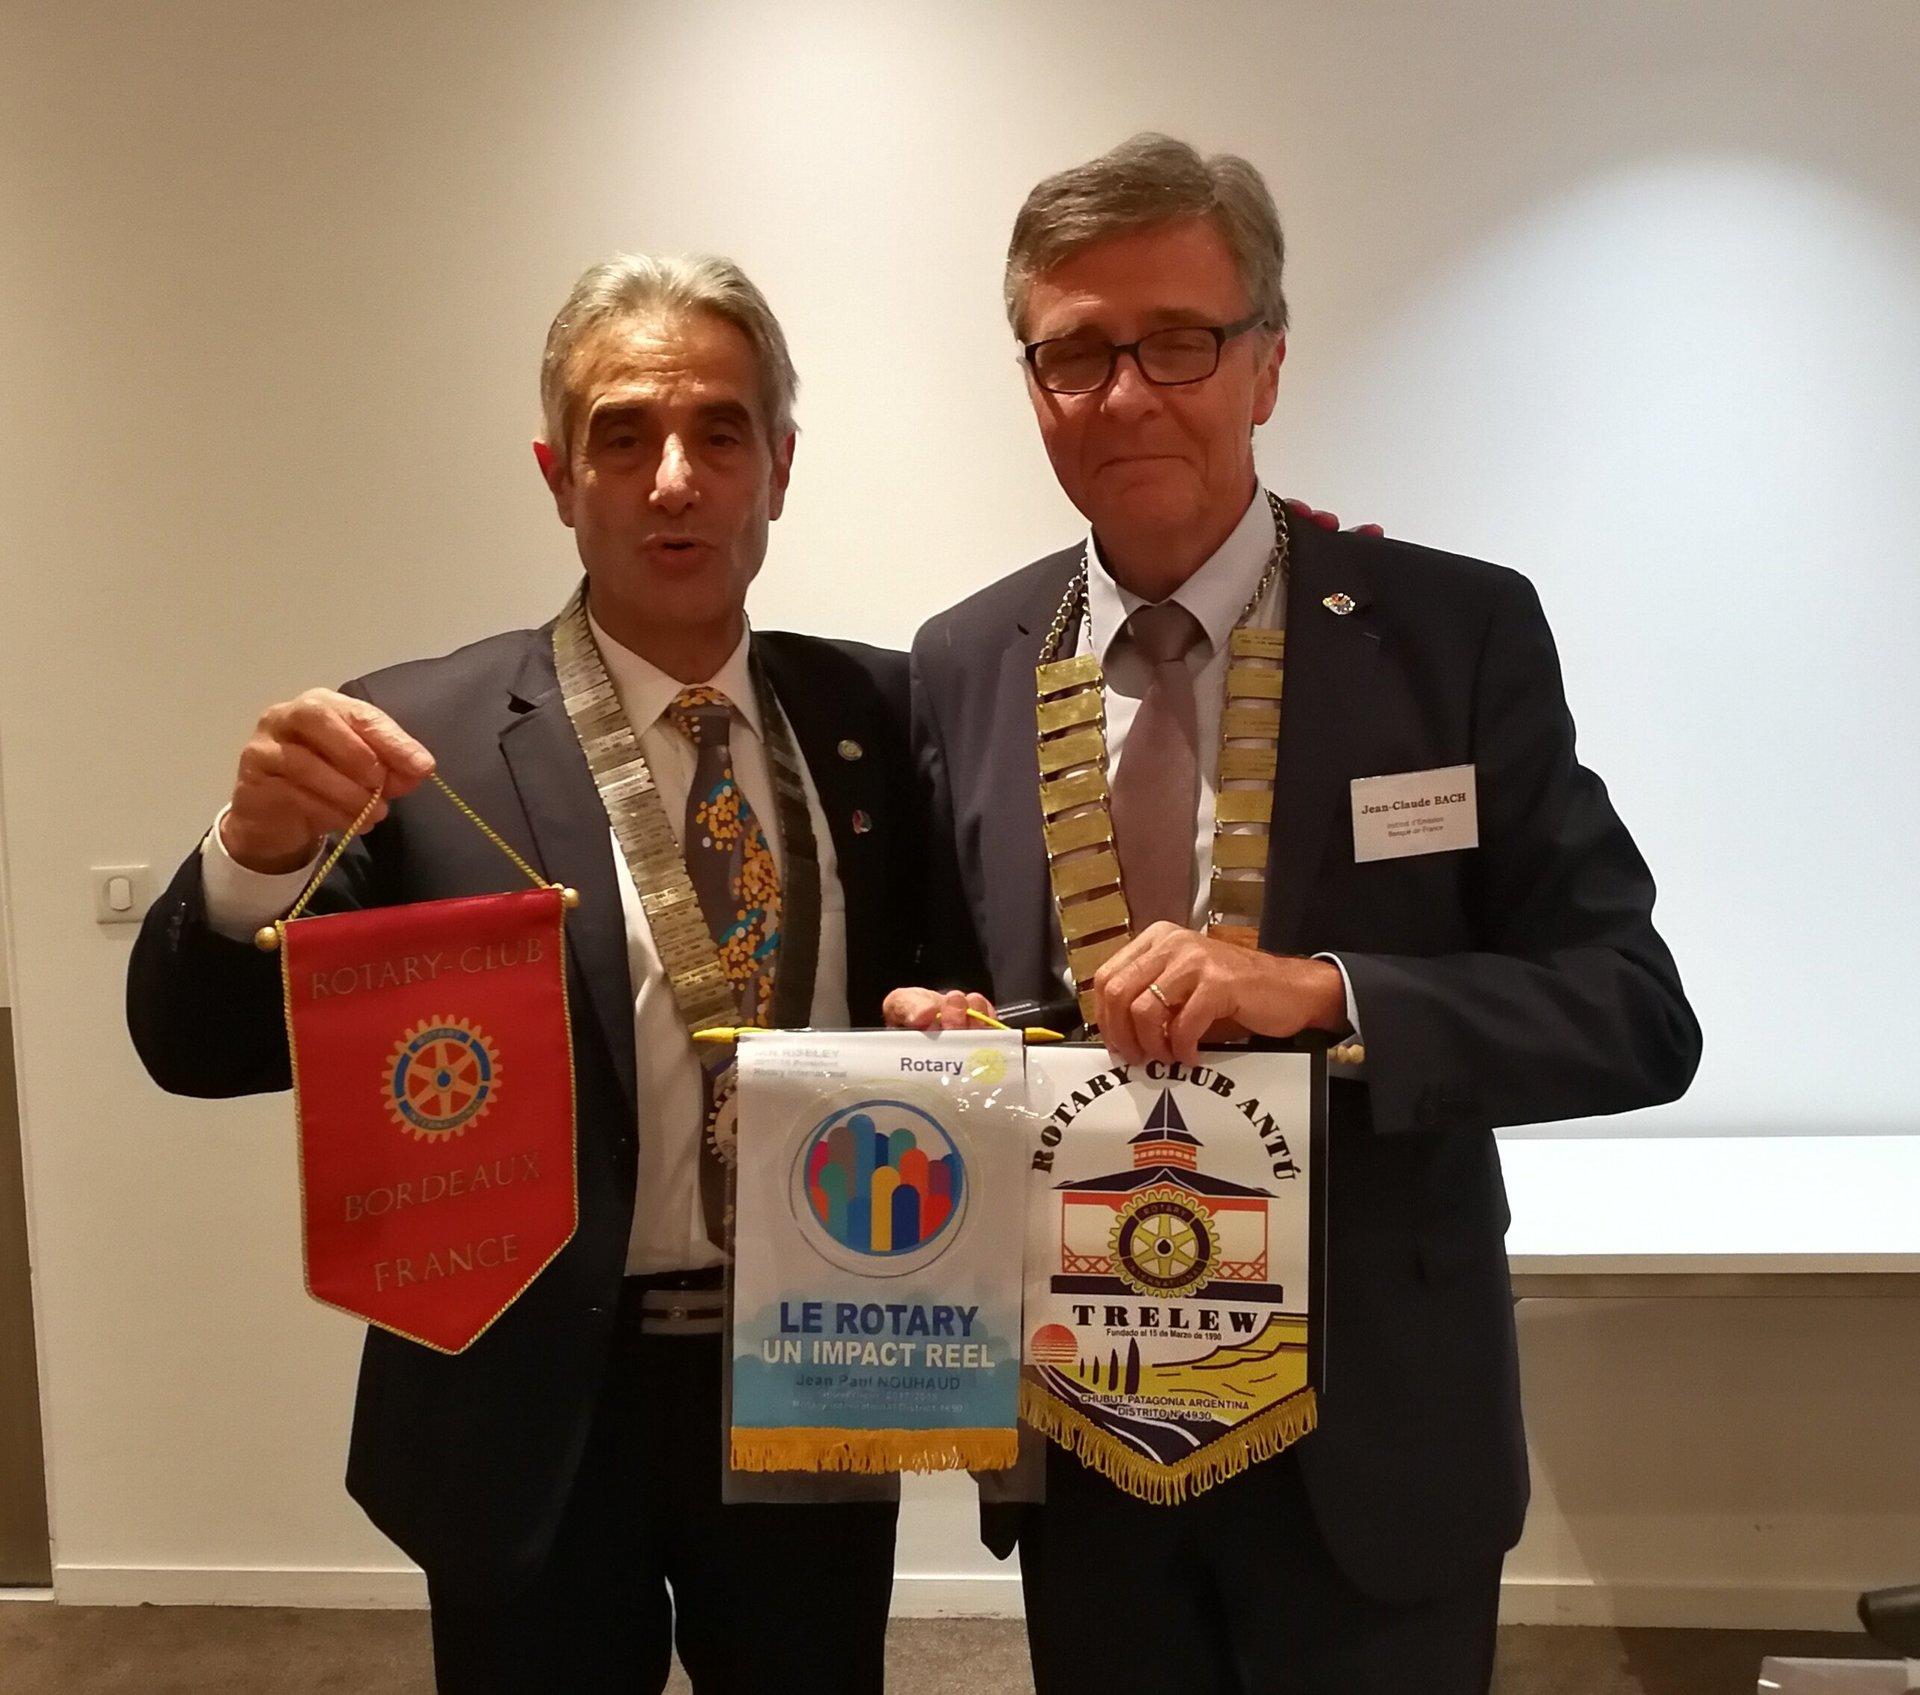 Rotary Club Bordeaux - District 1690 : Jean-Paul NOUHAUD - Jean-Claude BACH